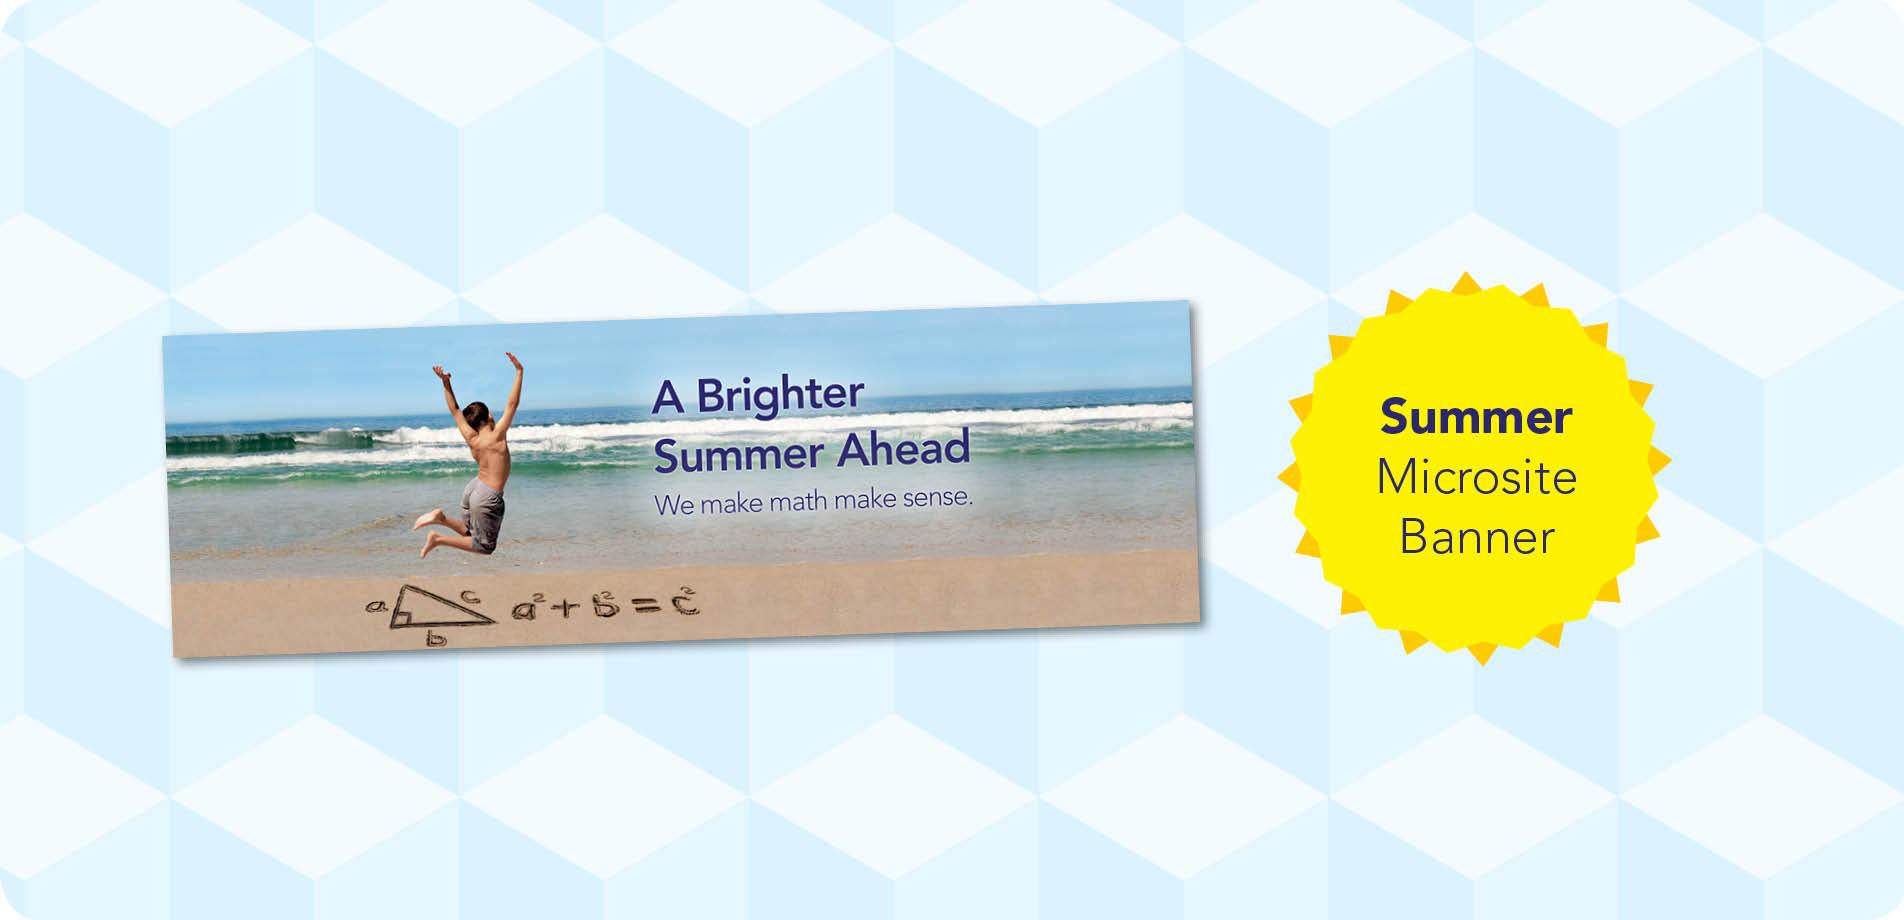 Sample-Email-Summer-Beach-Microsite-Banner-2016